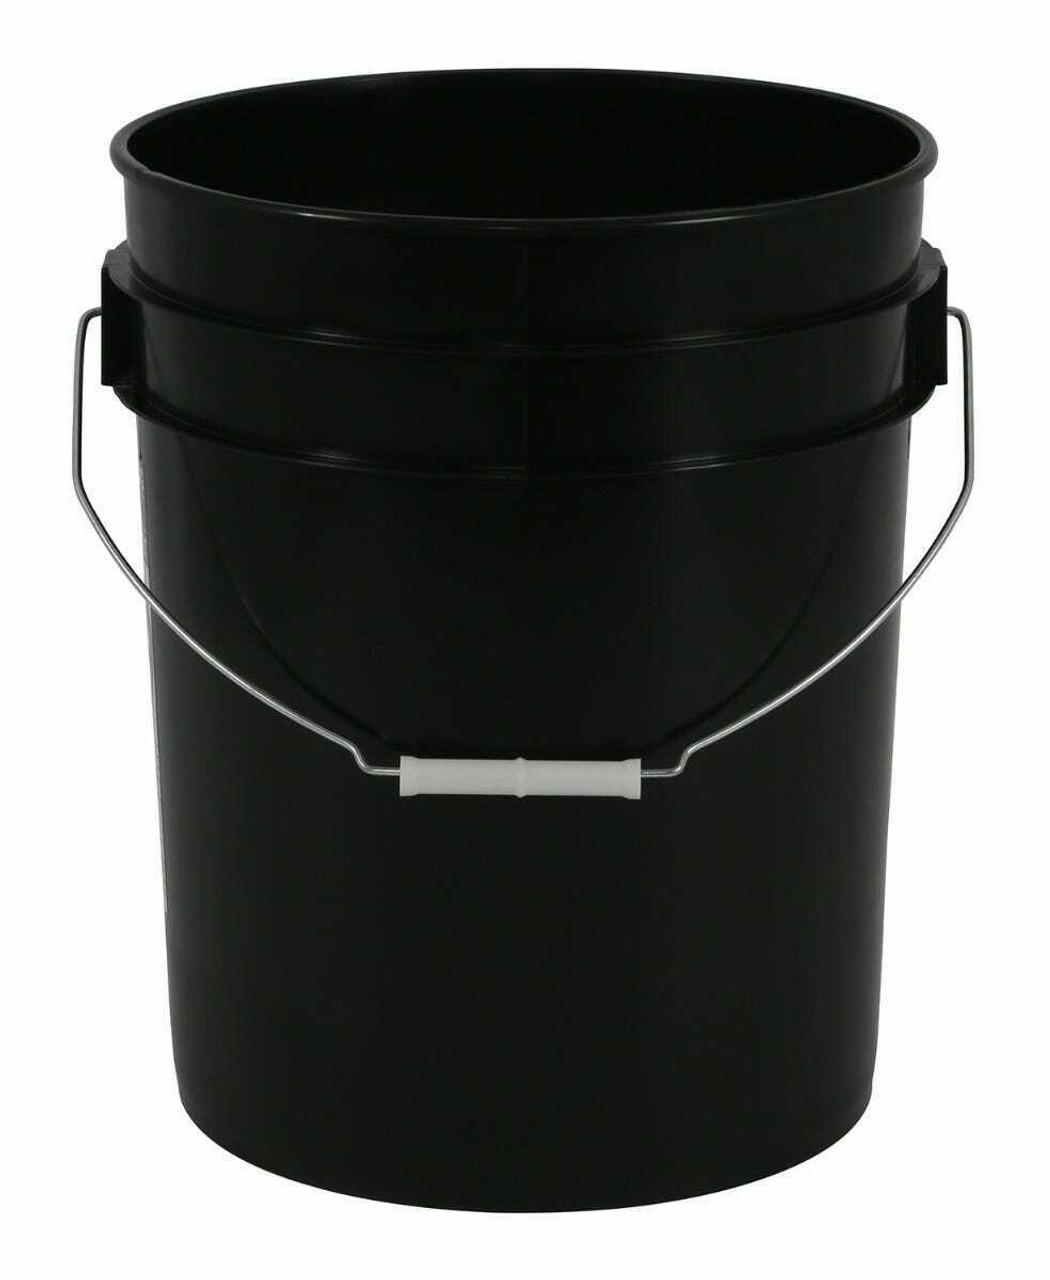 Gro Pro Black Plastic Bucket 5 Gallon - 1